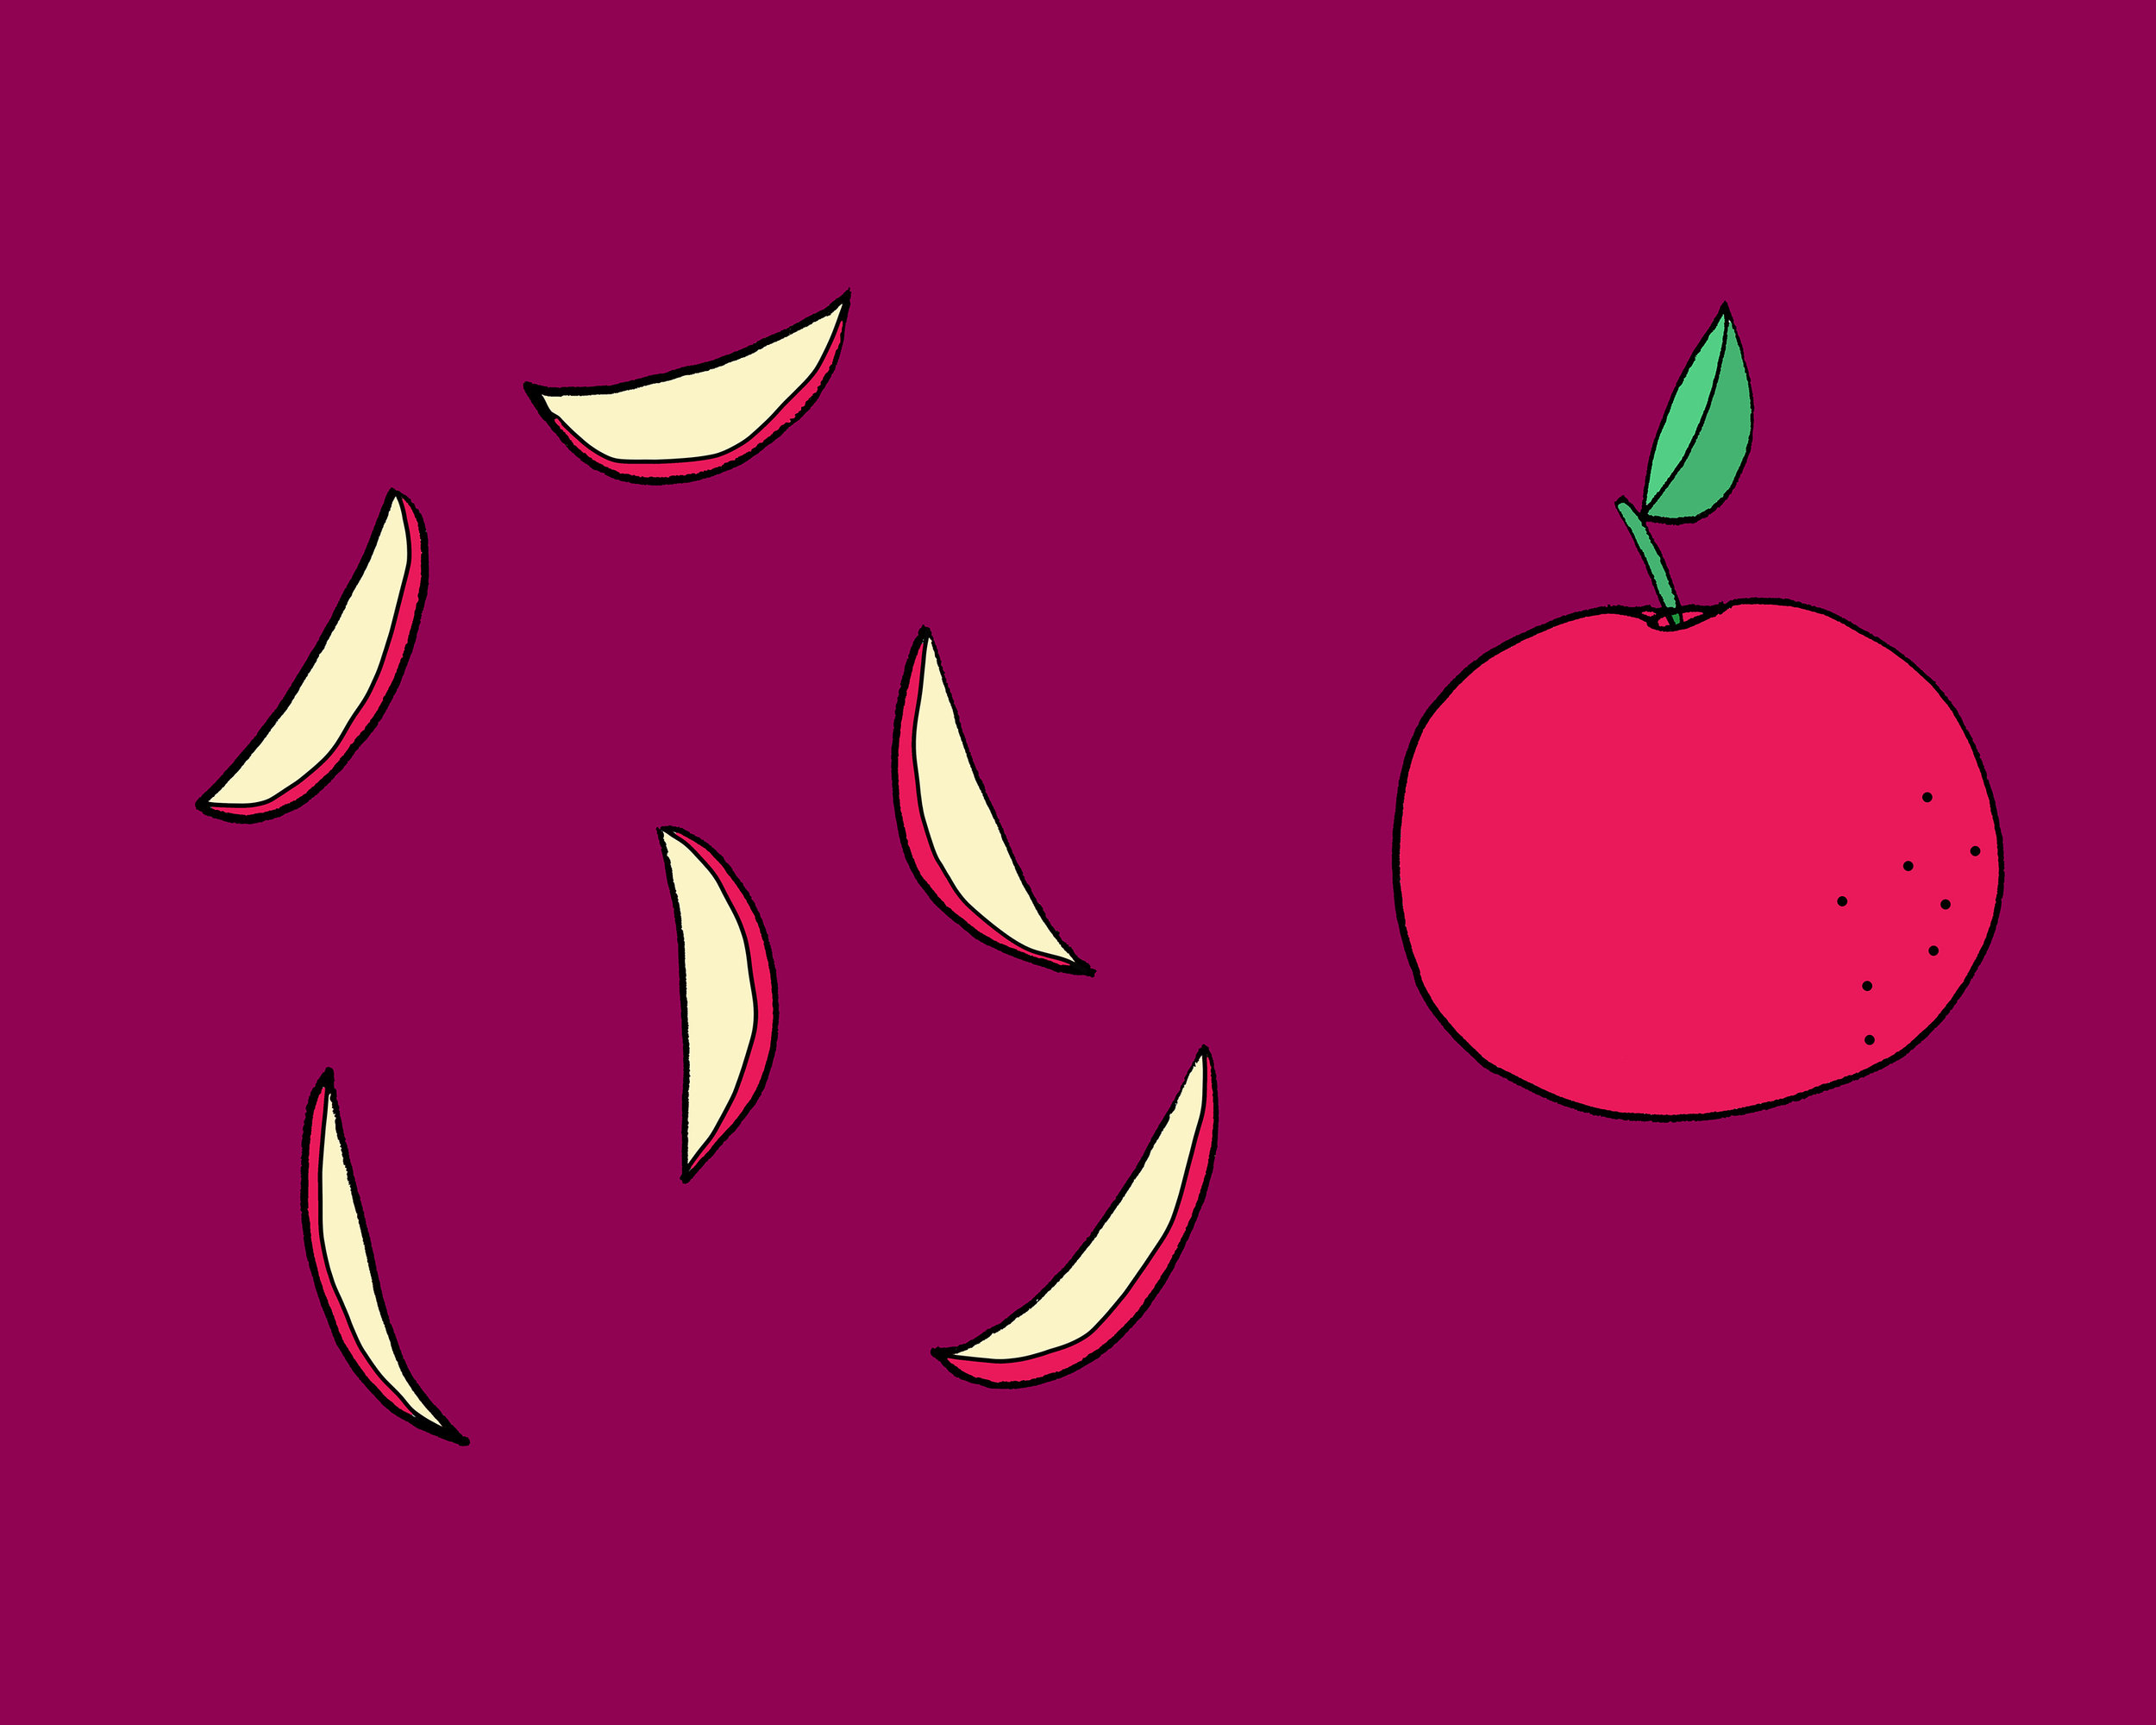 Apple Illustration by Emma Freeman Designs